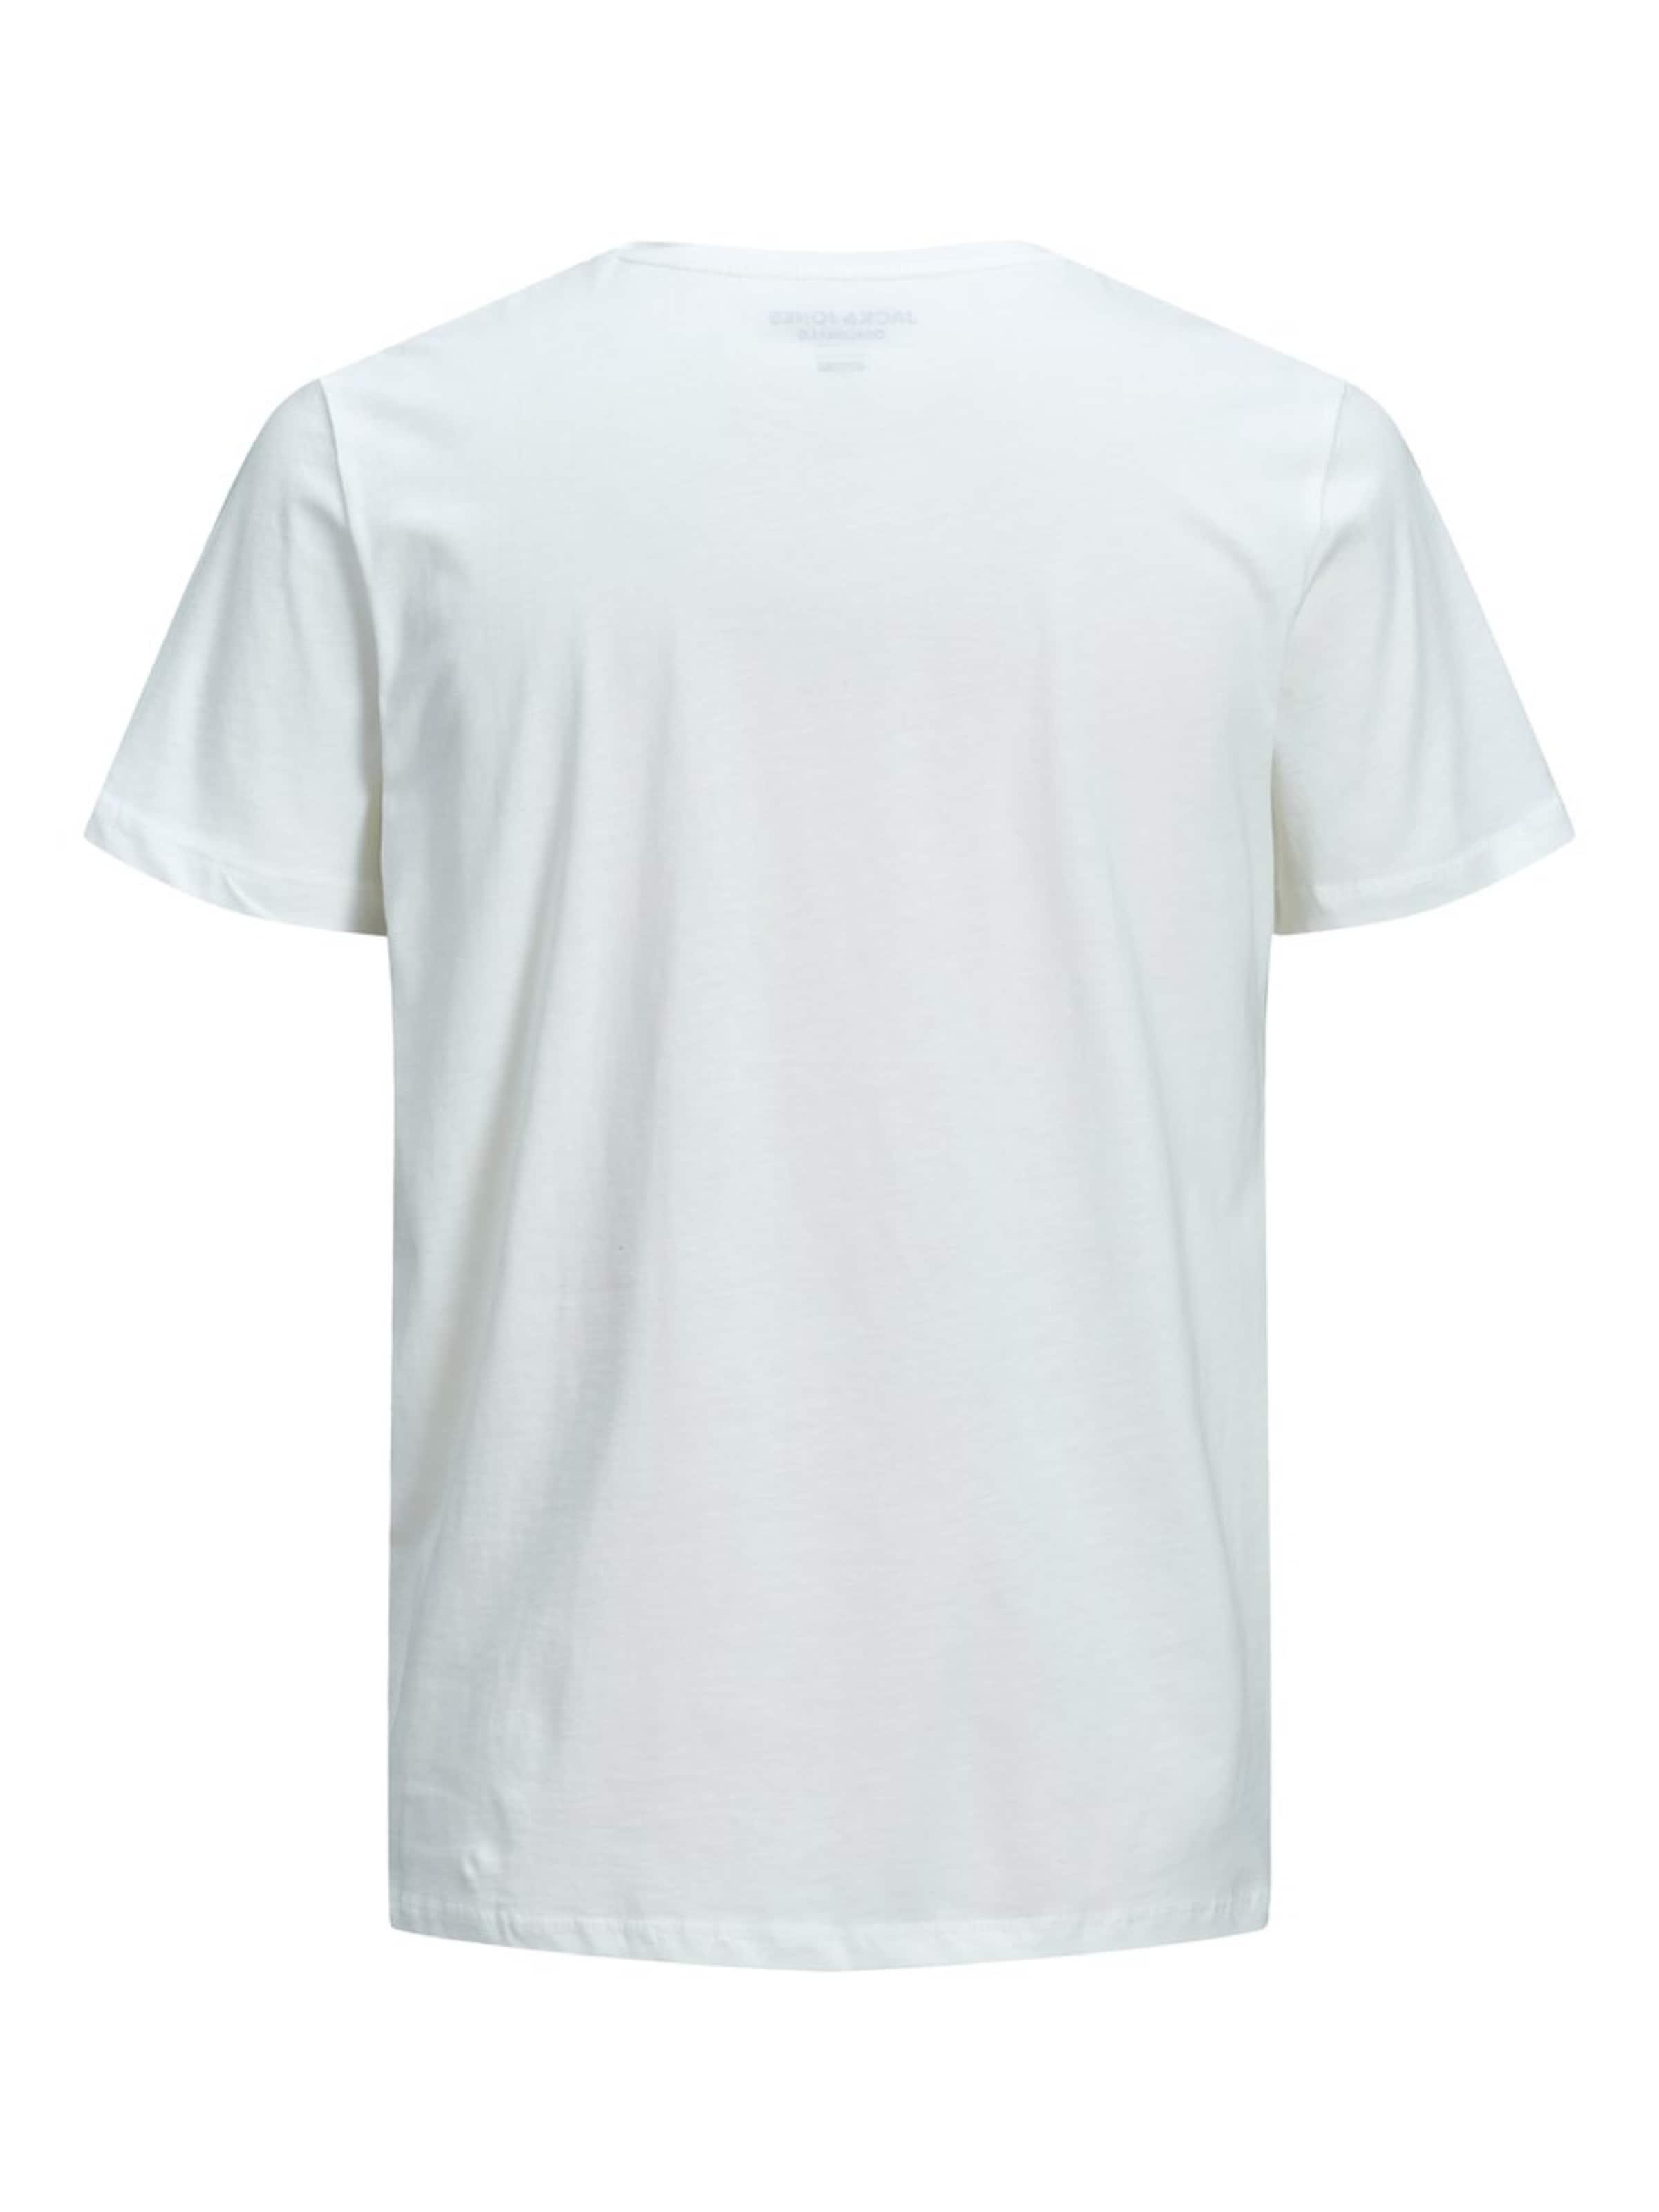 Jones Jackamp; Blanc shirt T En HD9E2I